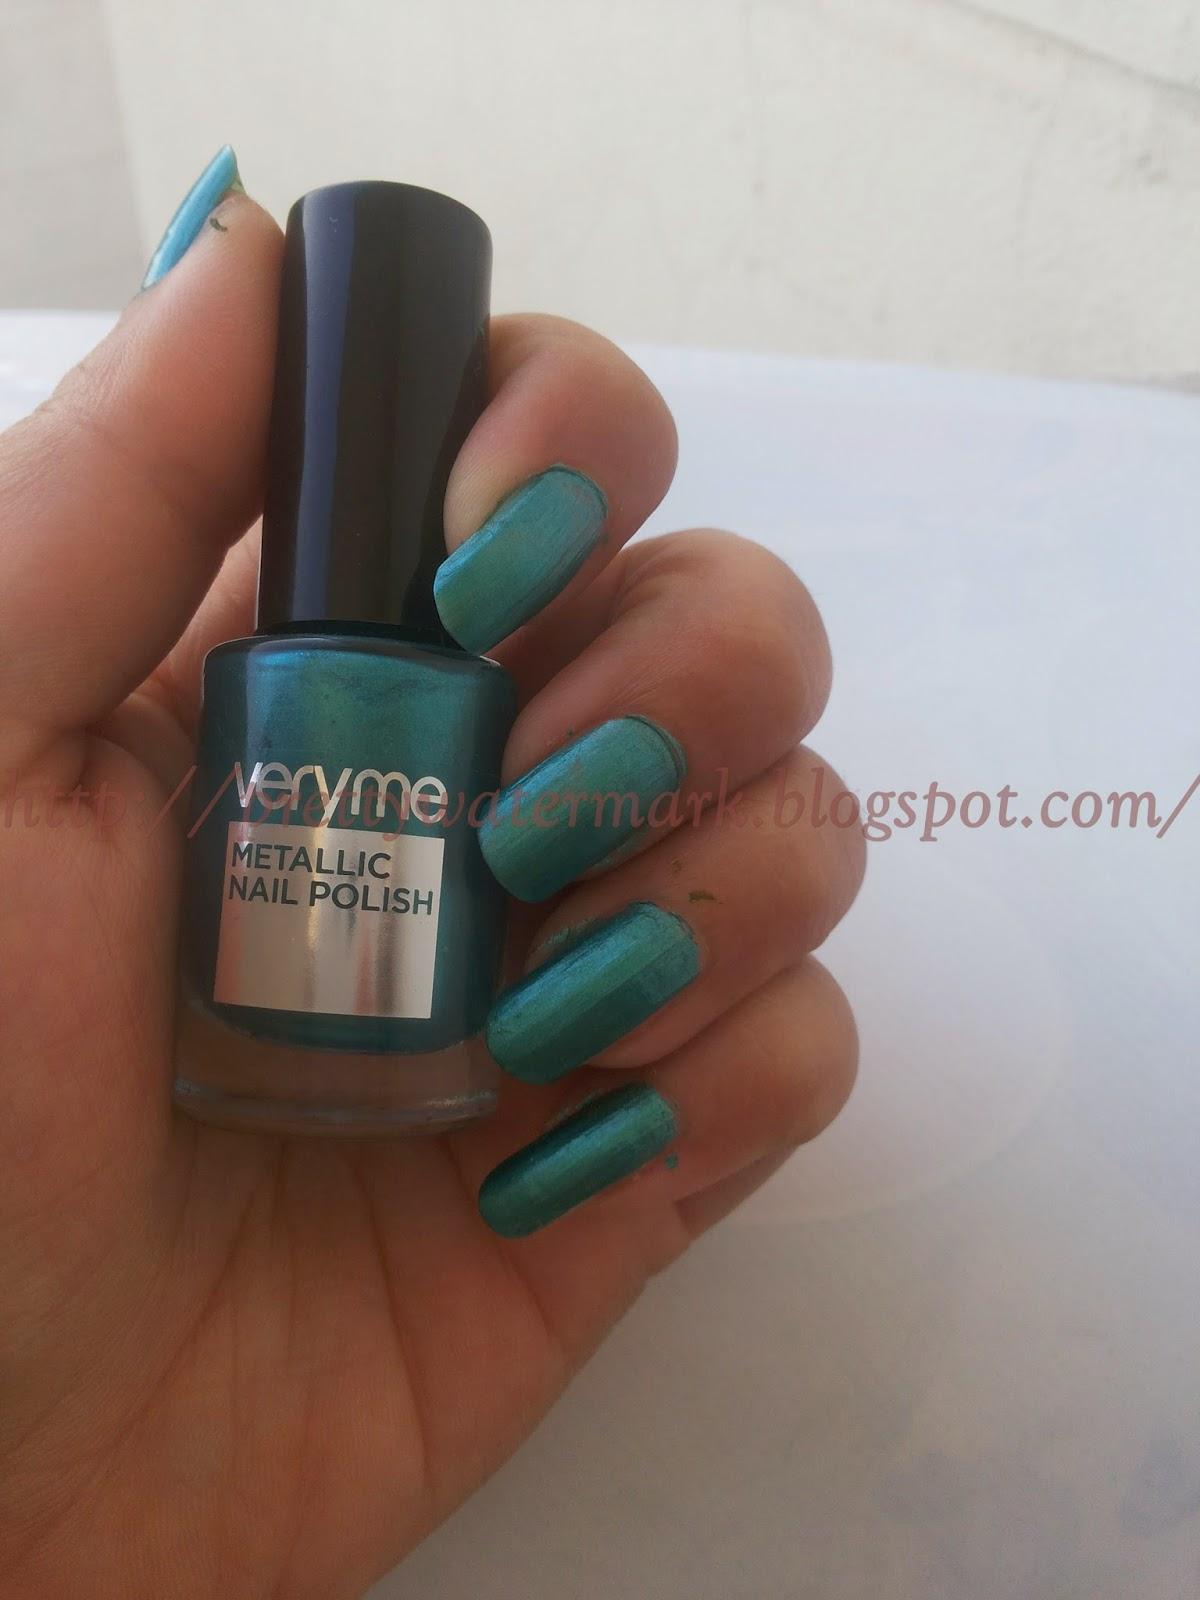 On My Nails Today-Very Me Metallic Nail Polish-Aqua Green | Latest ...